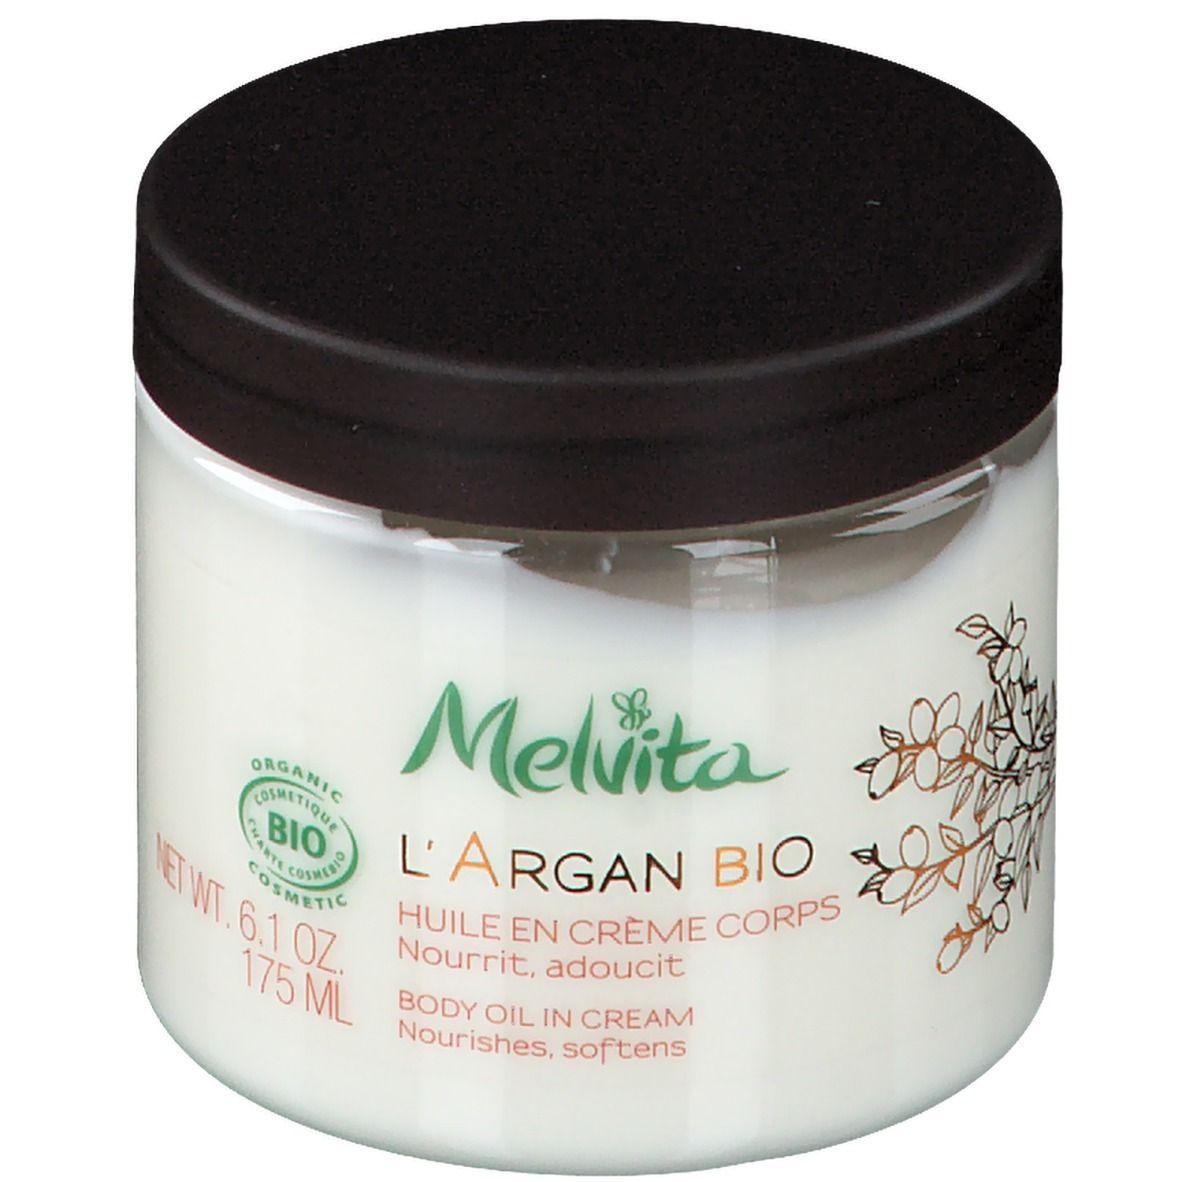 Melvita l'Argan Bio Huile en Crème Corps Bio ml huile